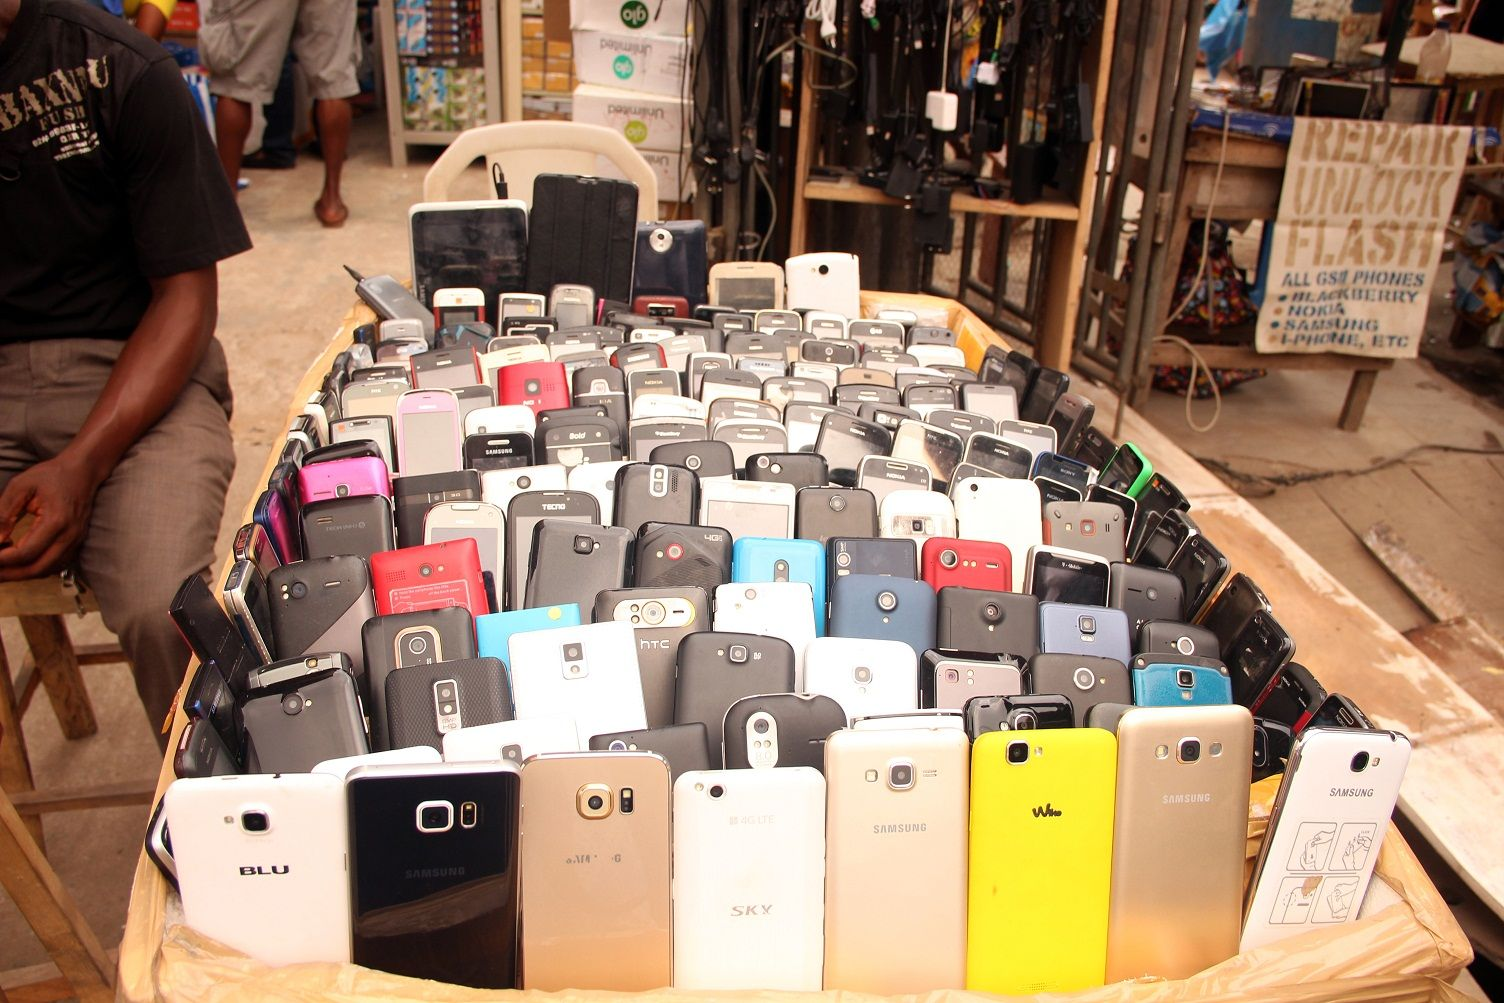 Why stolen phones market is still booming in Nigeria